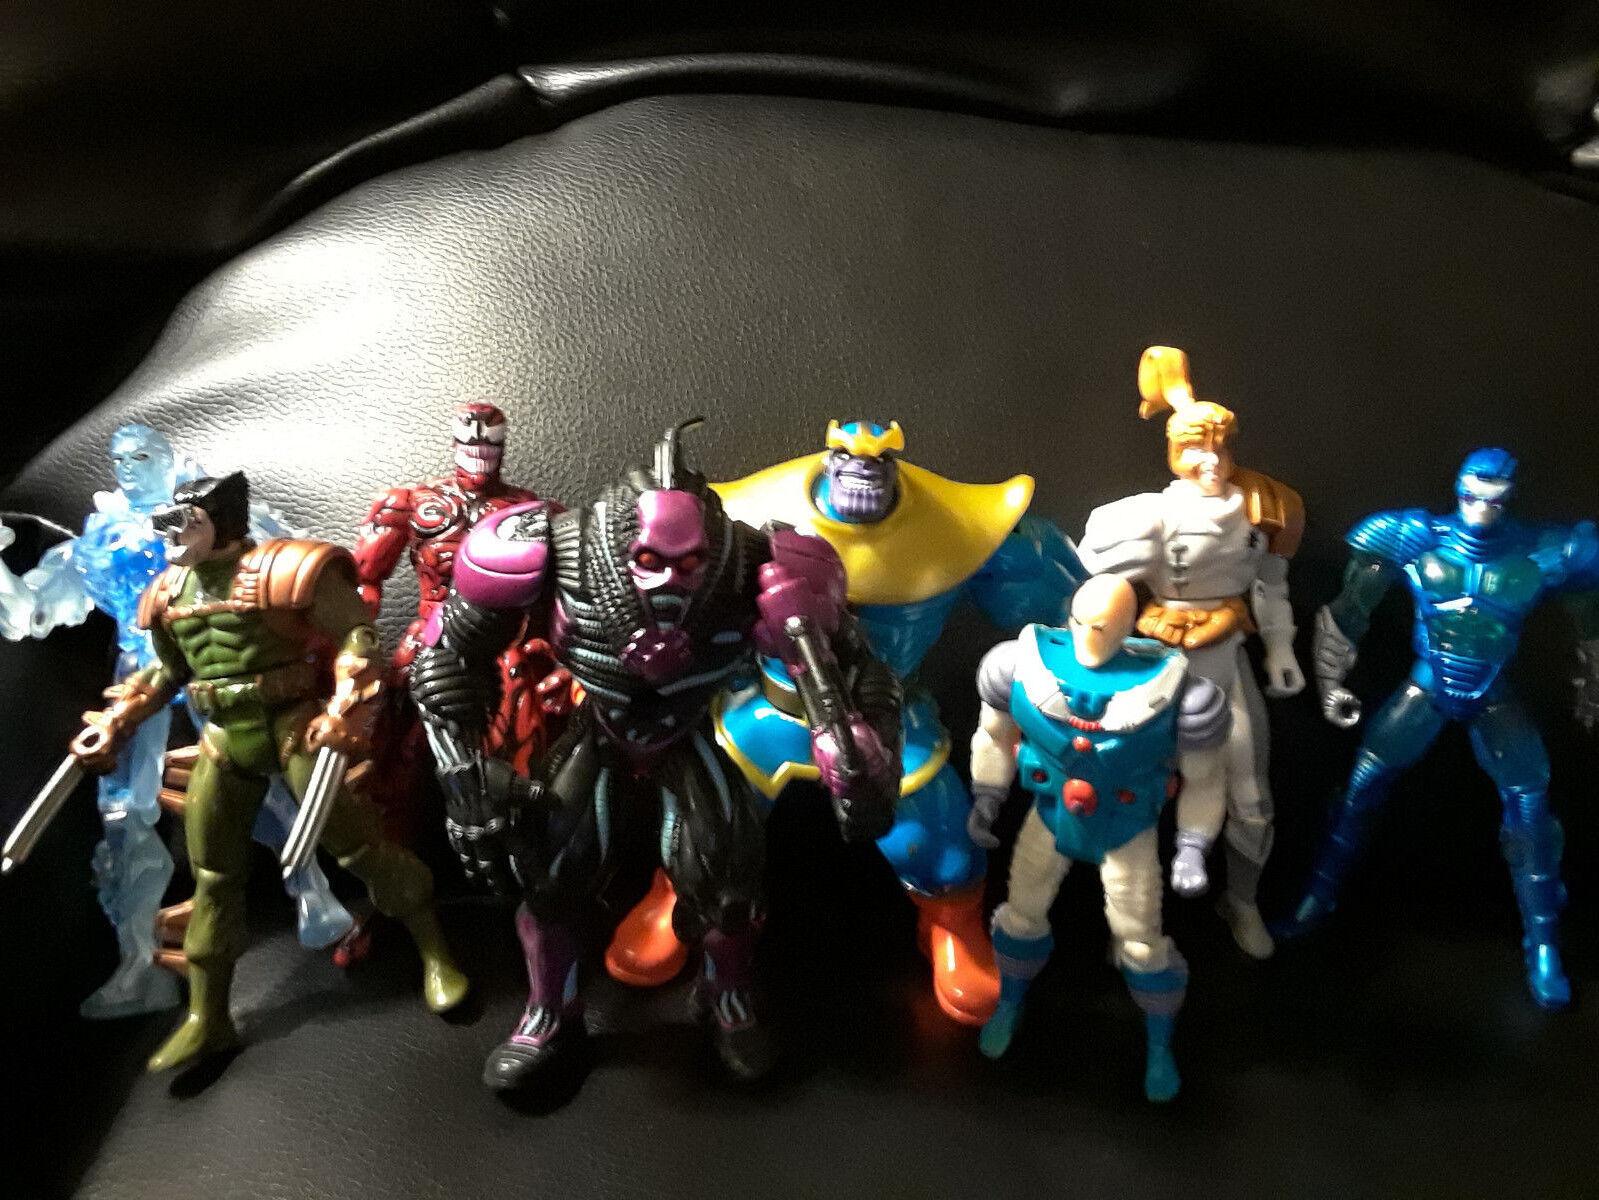 Marvel '90's Lot Figurines Figurines Figurines Toy Biz Thanos Xmen Iceman Mr. Freeze X Pro Shatter 0d1e94